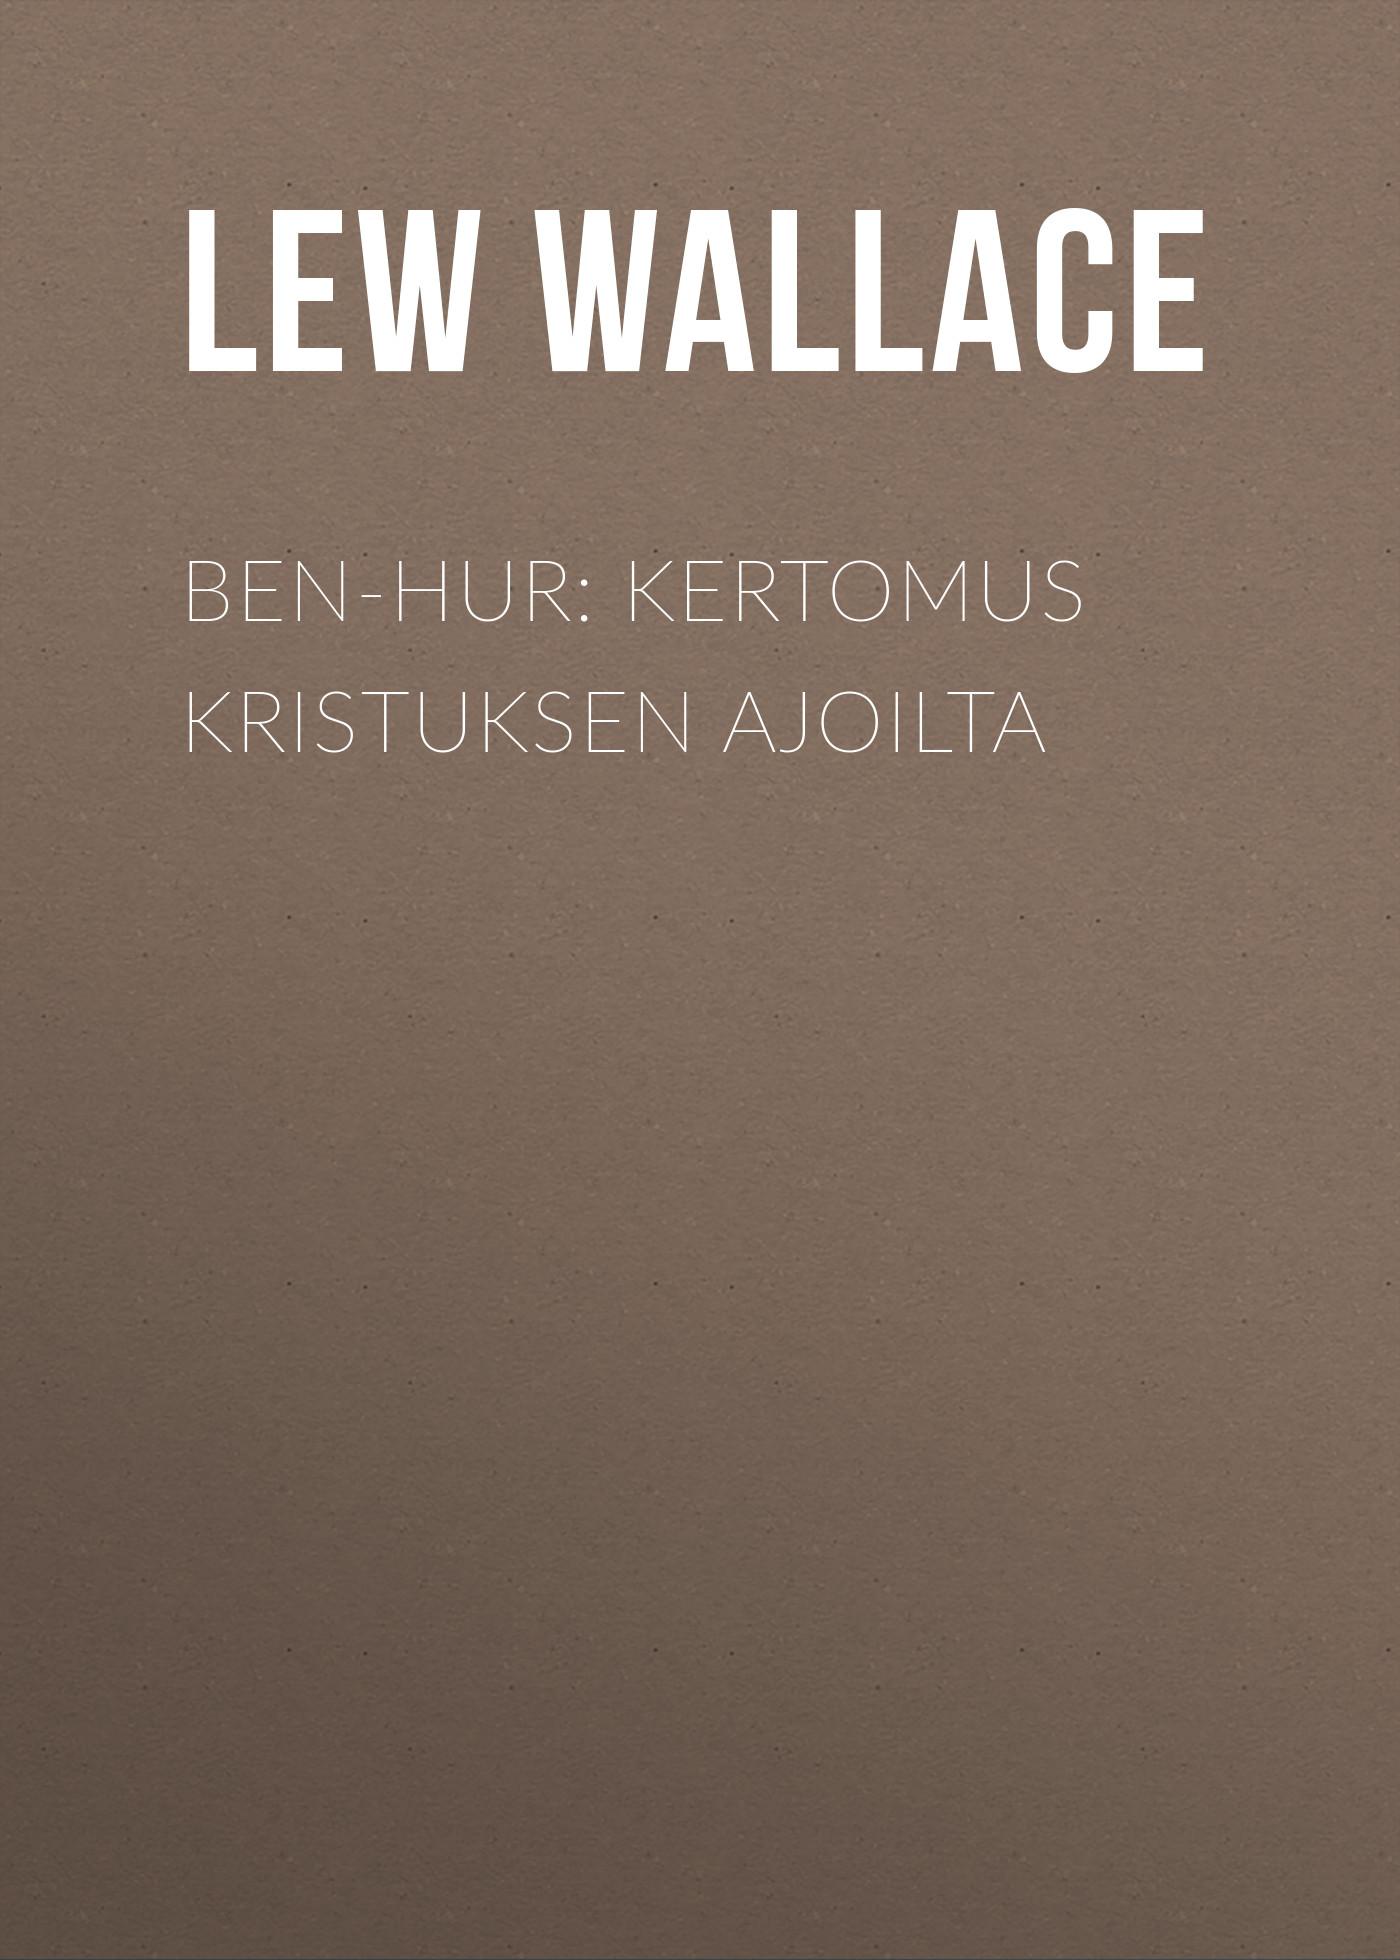 Lew Wallace Ben-Hur: Kertomus Kristuksen ajoilta недорого